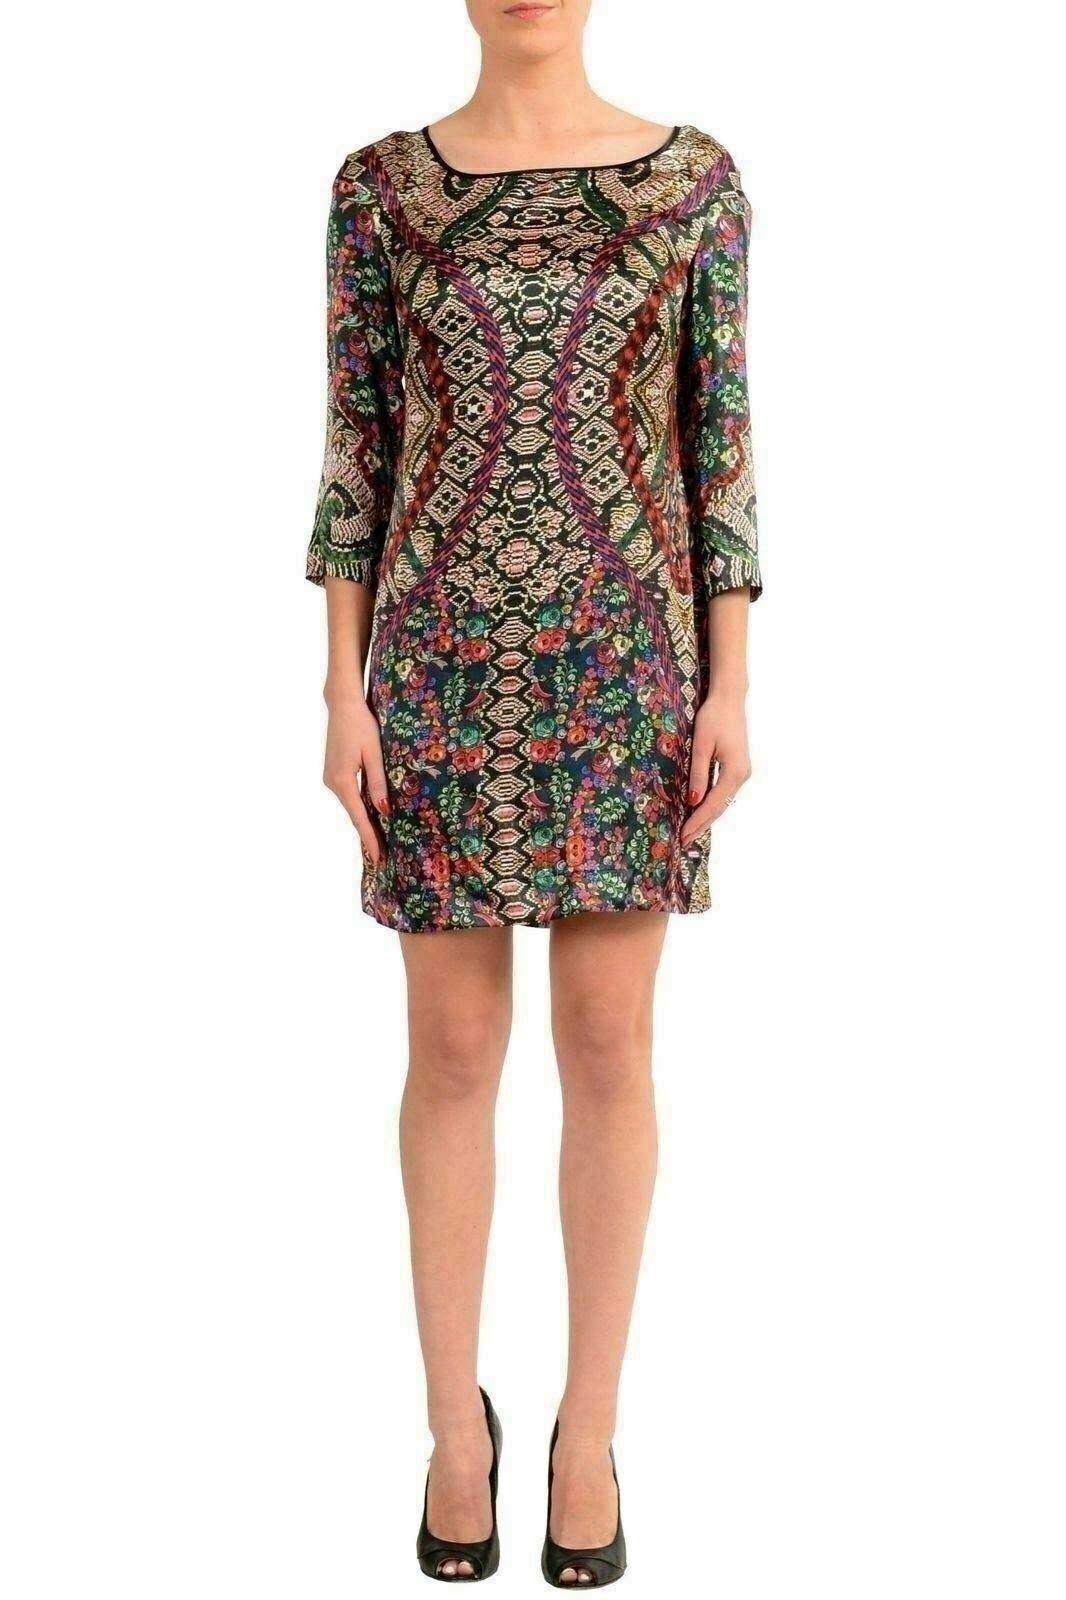 Just Cavalli Women'S 100% Silk Patterned 3 4 Sleeve Tunic Dress US S IT 40